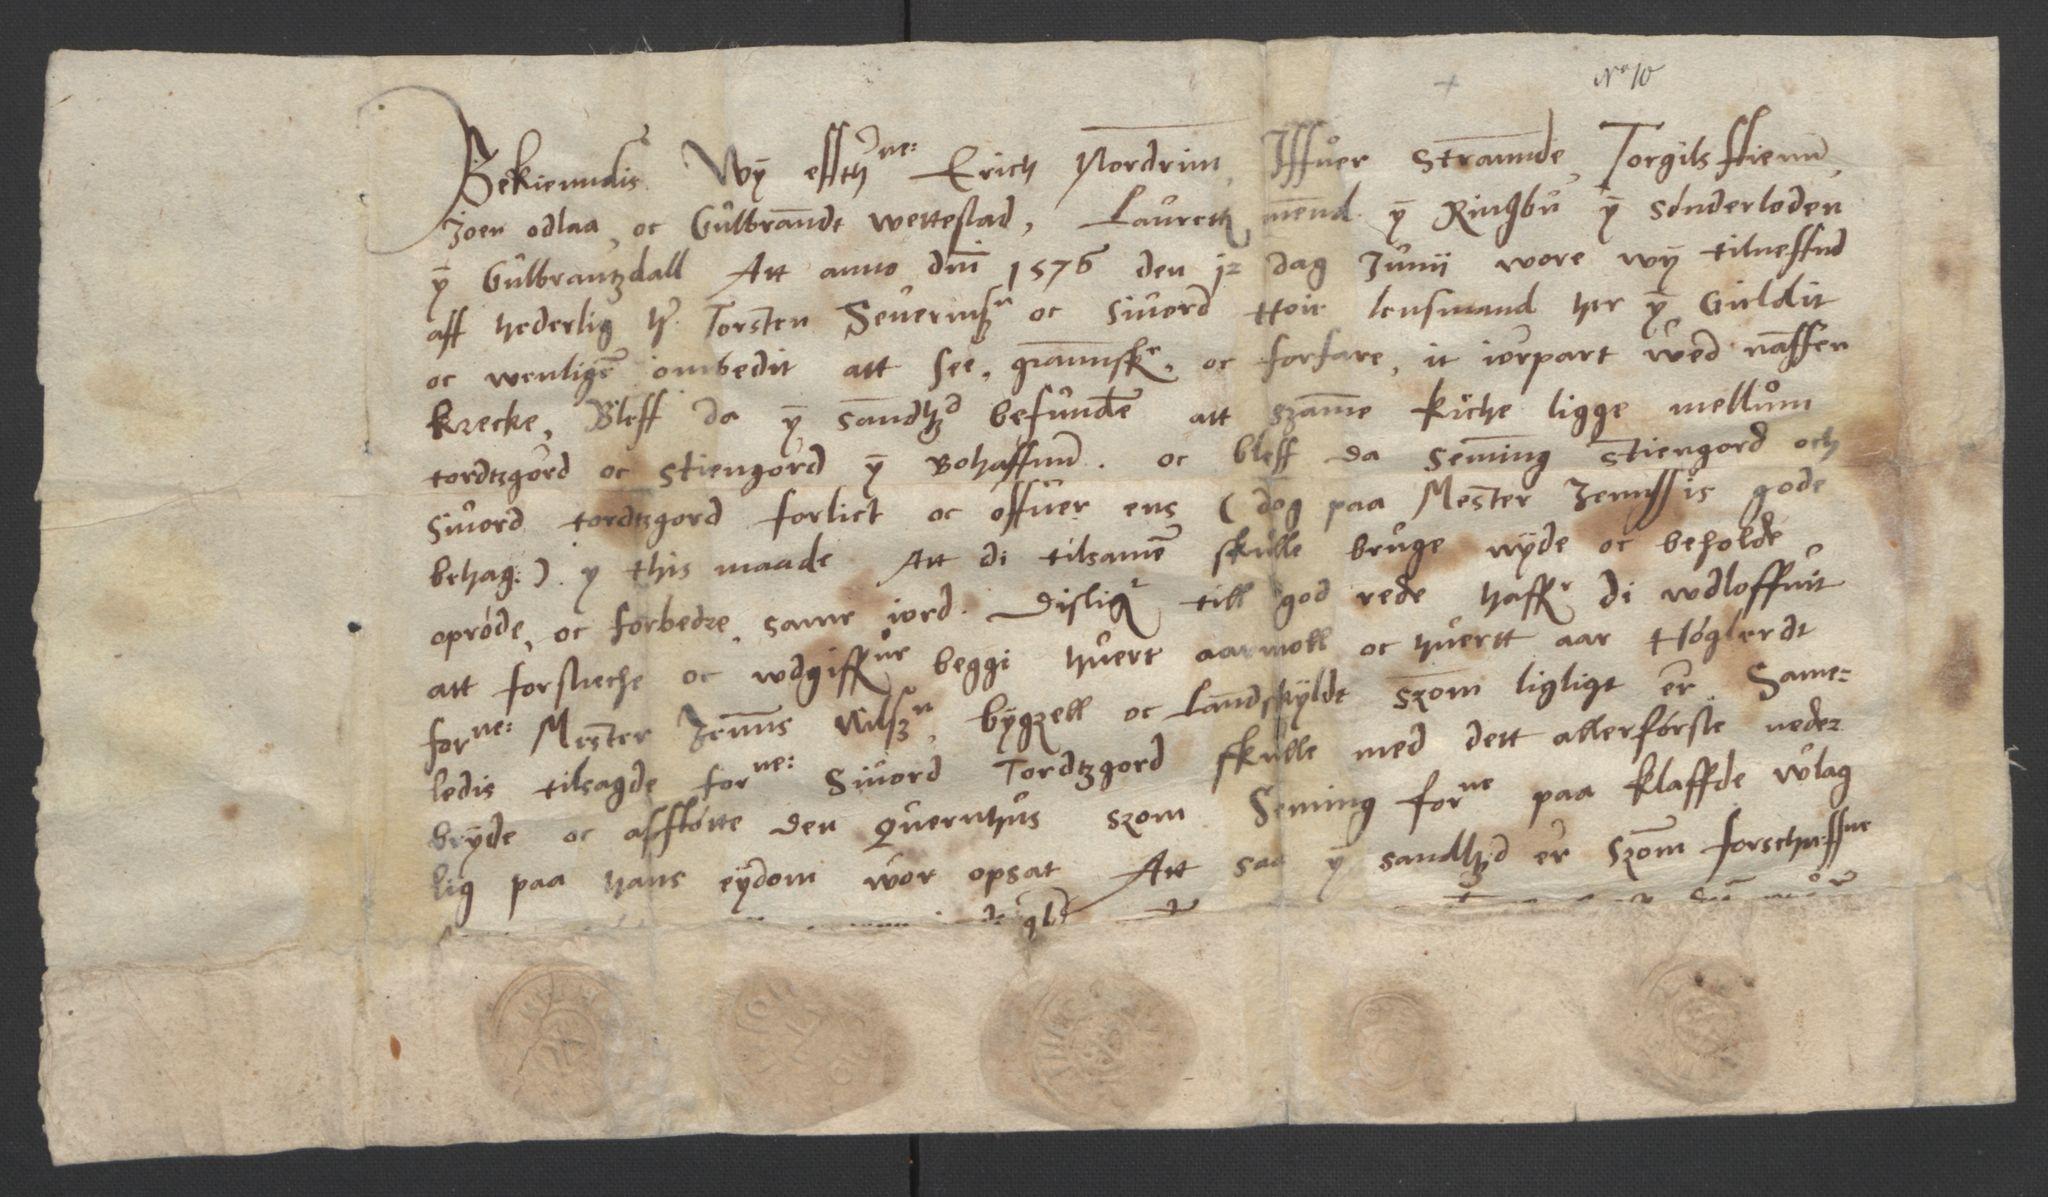 SAO, Oslo stiftsdireksjon, G/Gb/L0001: Bispestolens dokumenter, 1584-1612, s. 10